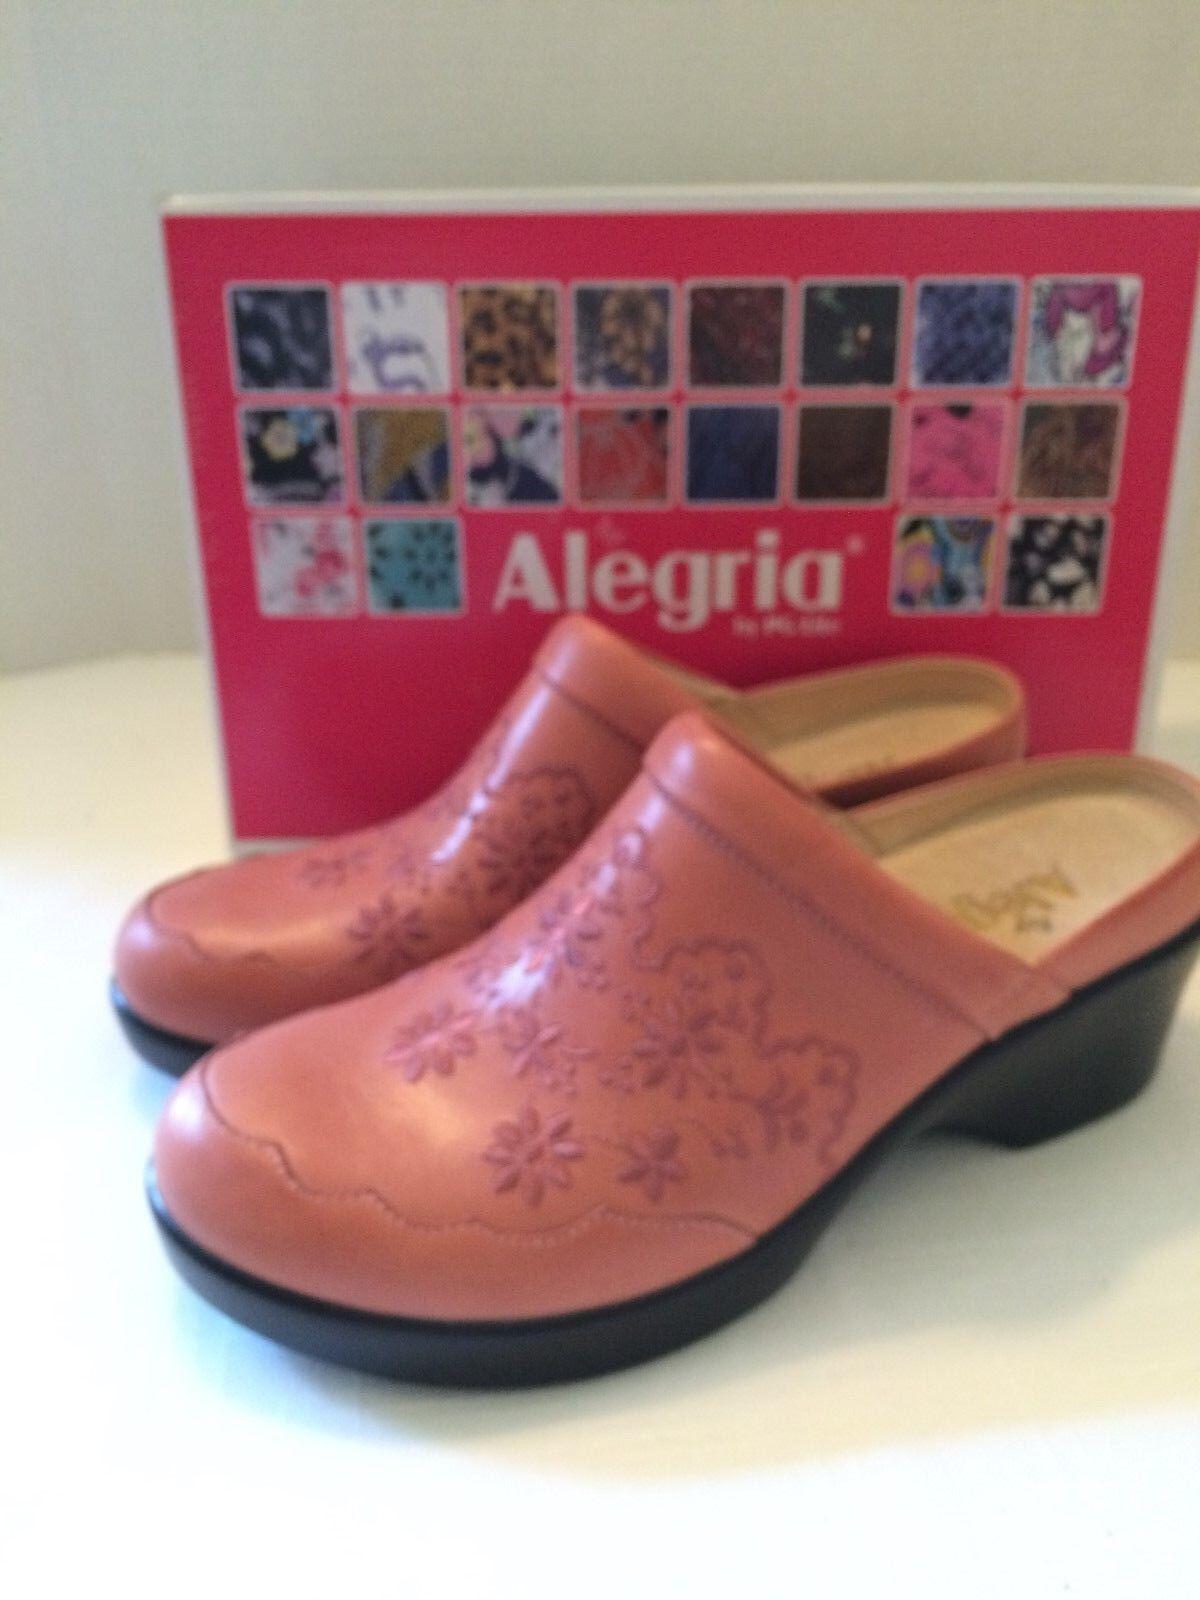 ALEGRIA EU Isabelle Salmon Leder Slip On Clogs Damenschuhe Sz EU ALEGRIA 38 Slip Resistant f1ac09